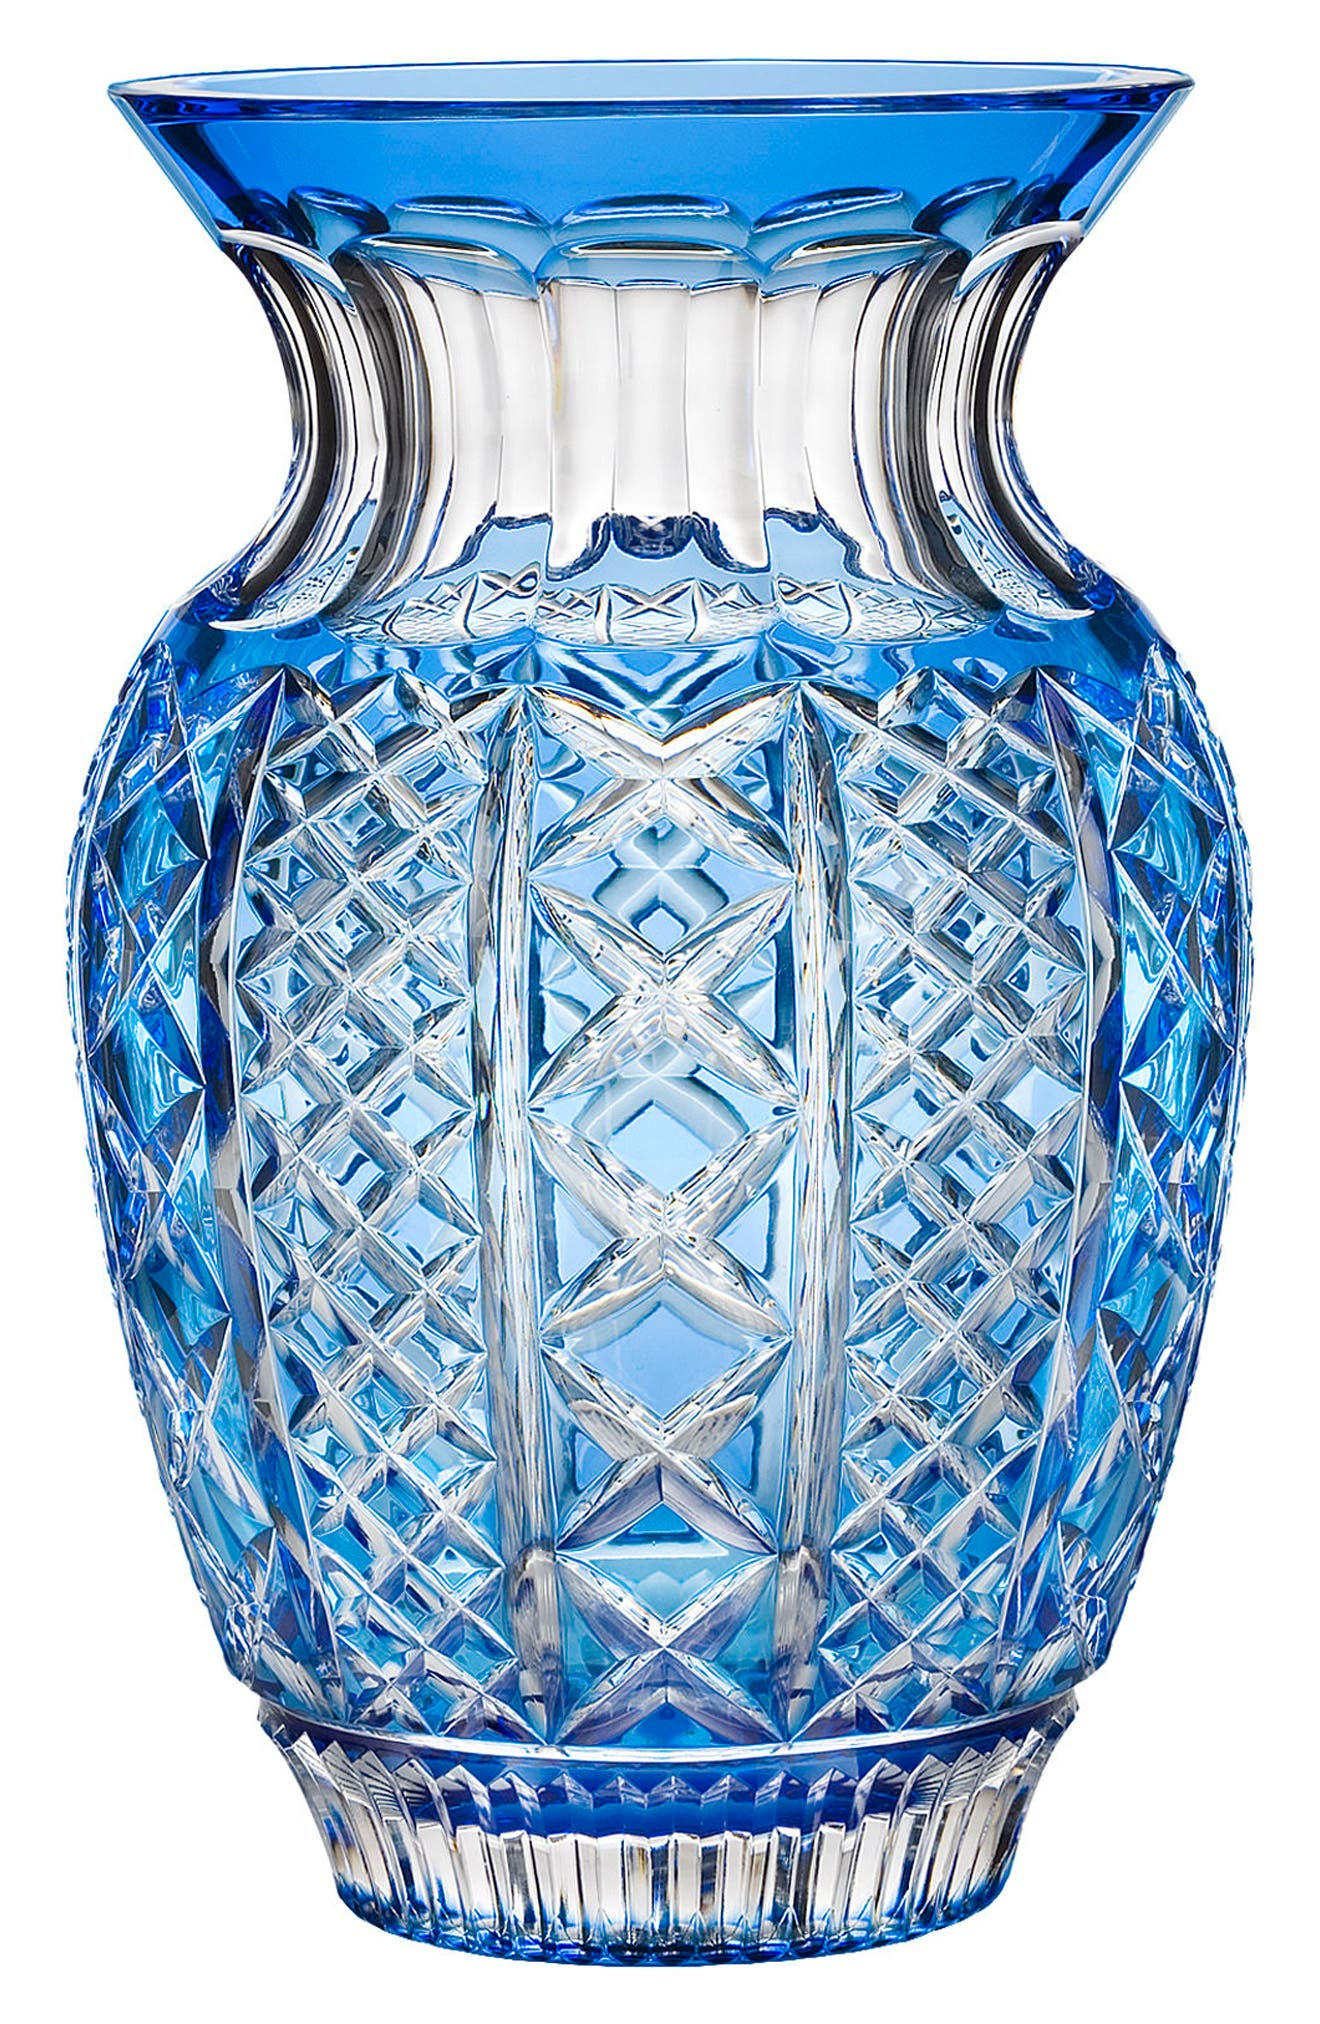 Main Image - Waterford Fleurology Jeff Leatham Molly Blue Bouquet Vase